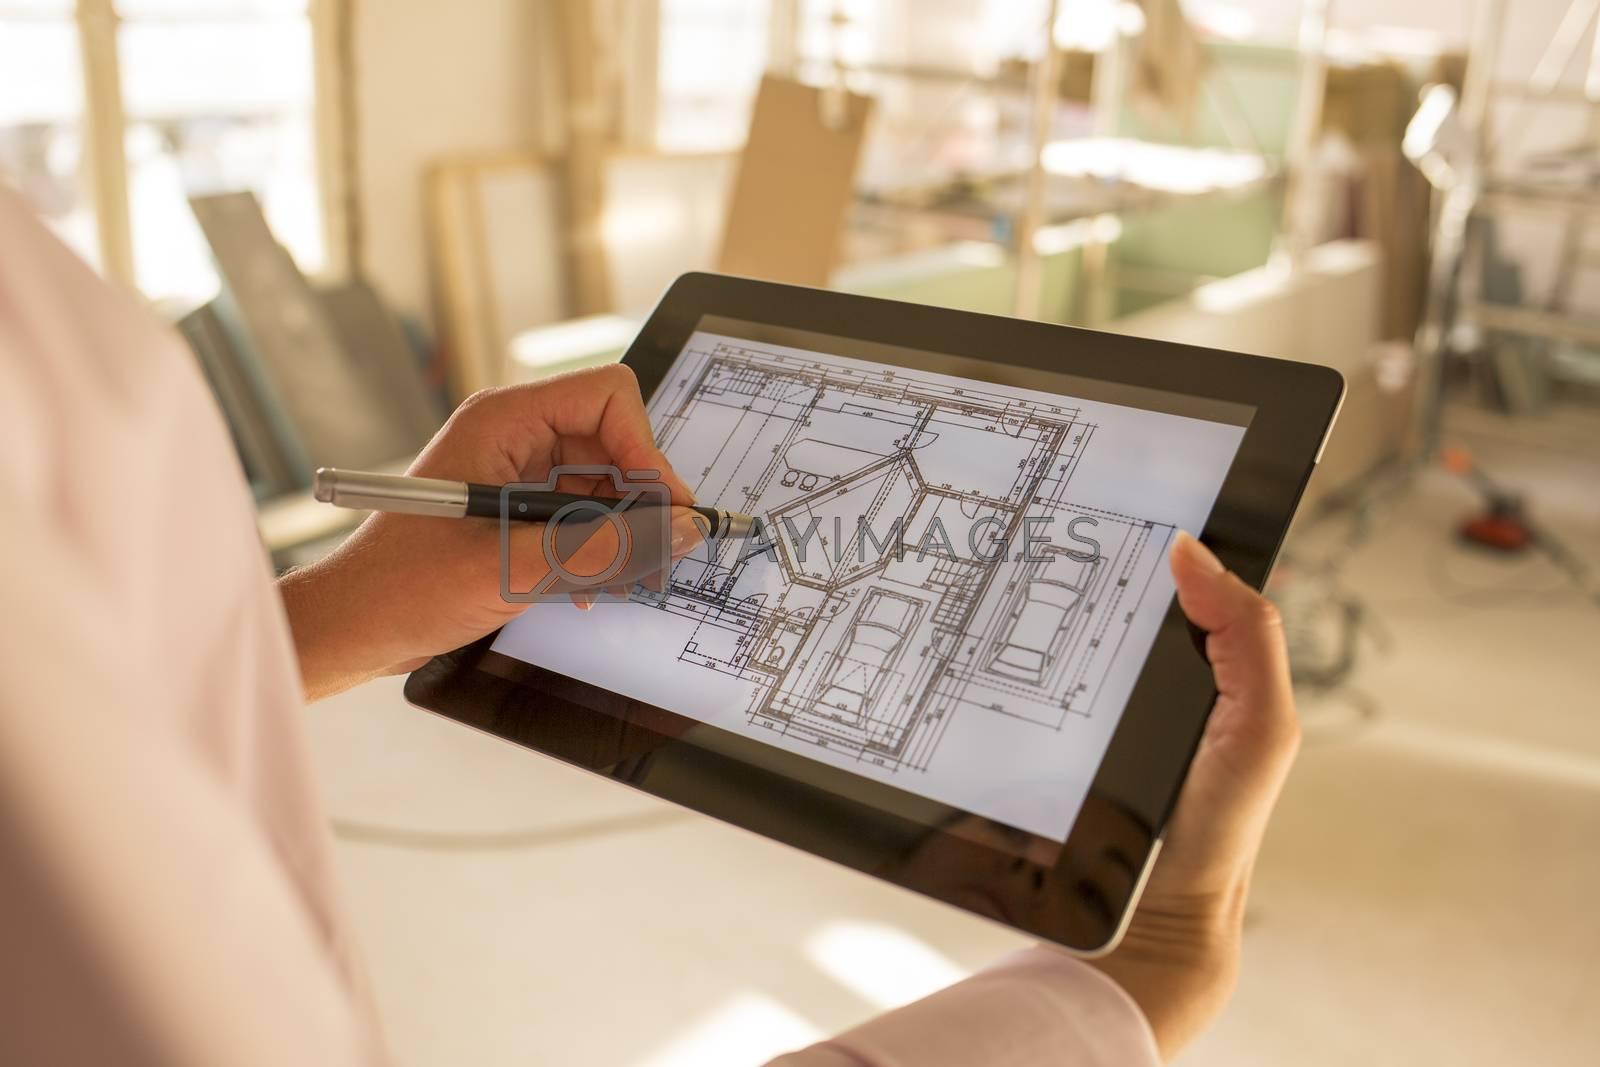 Female hand close-up computer work blueprint inside Stylus